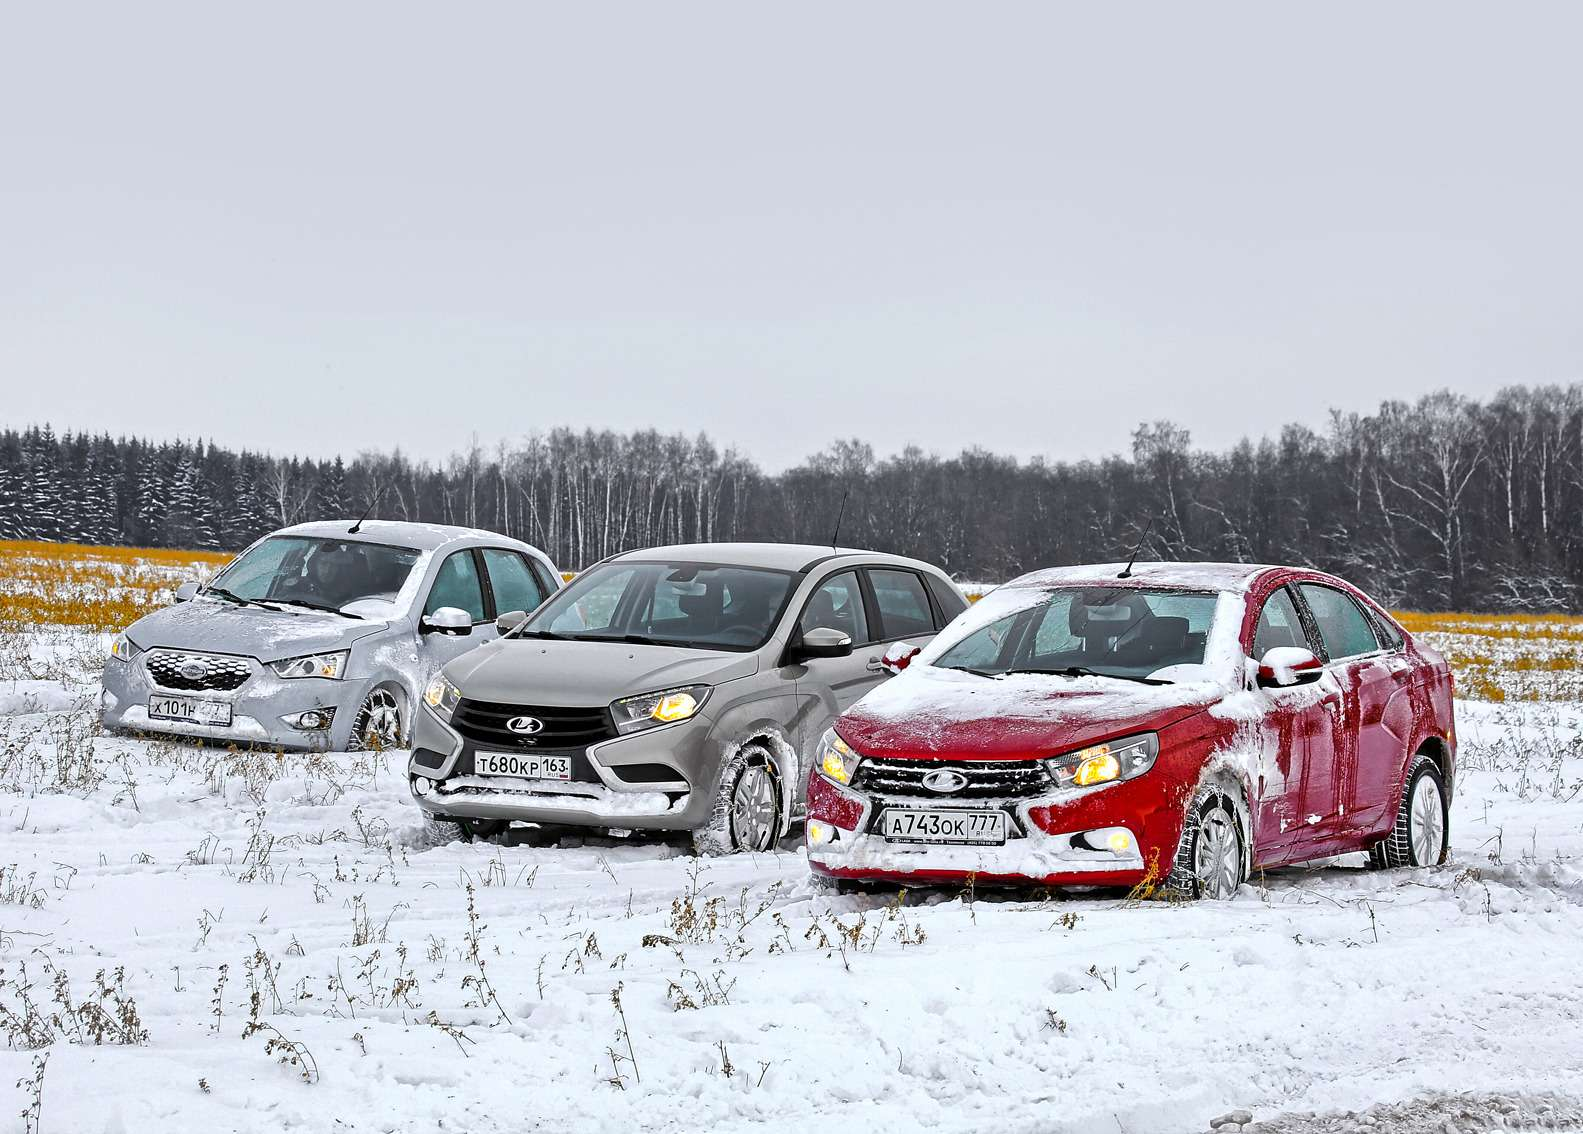 Большой зимний тест: Lada Vesta, Lada XRAY иDatsun mi-DO изпарка ЗР— фото 571780